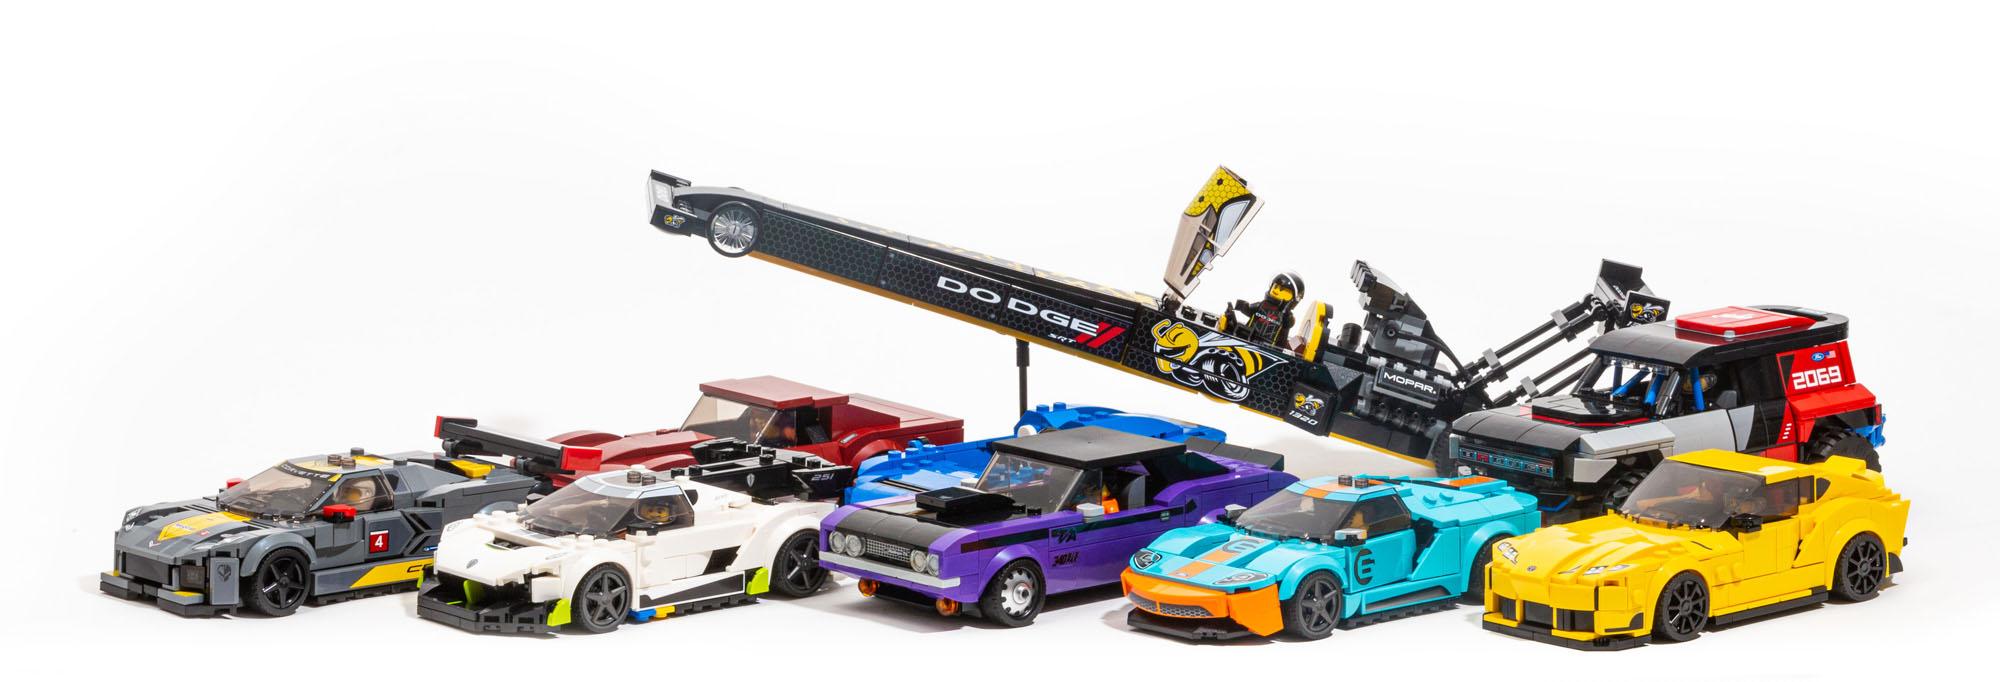 LEGO 2021 Speed Champions